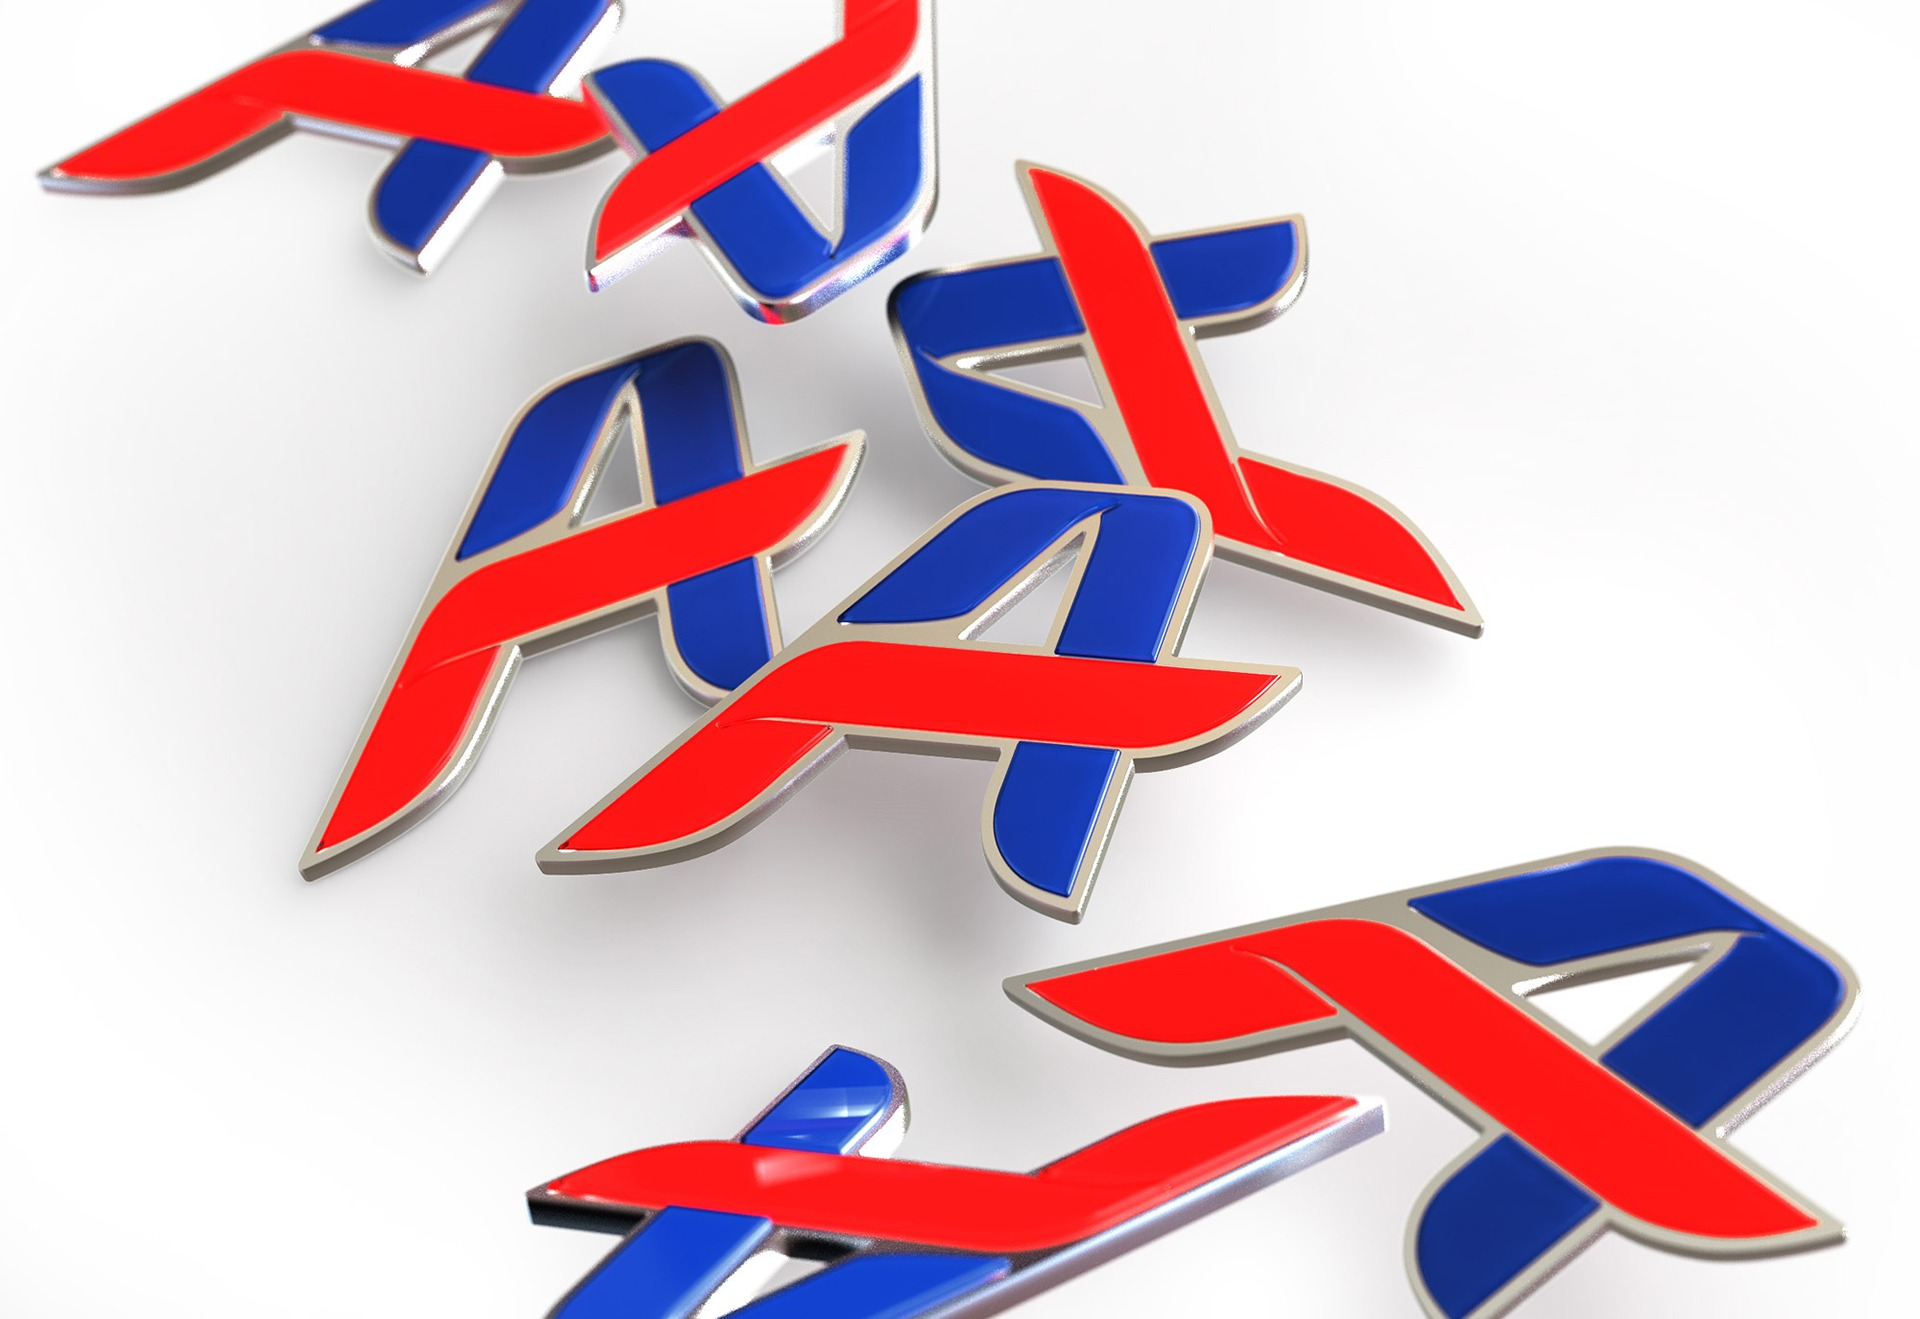 Фирменный стиль авиакомпании Аэрофлот,, re-branding, ребрендинг авиакомпании, Asgard Branding, Асгард, лого Аэрофлот, значки, Aeroflot airlines, Aeroflot badges